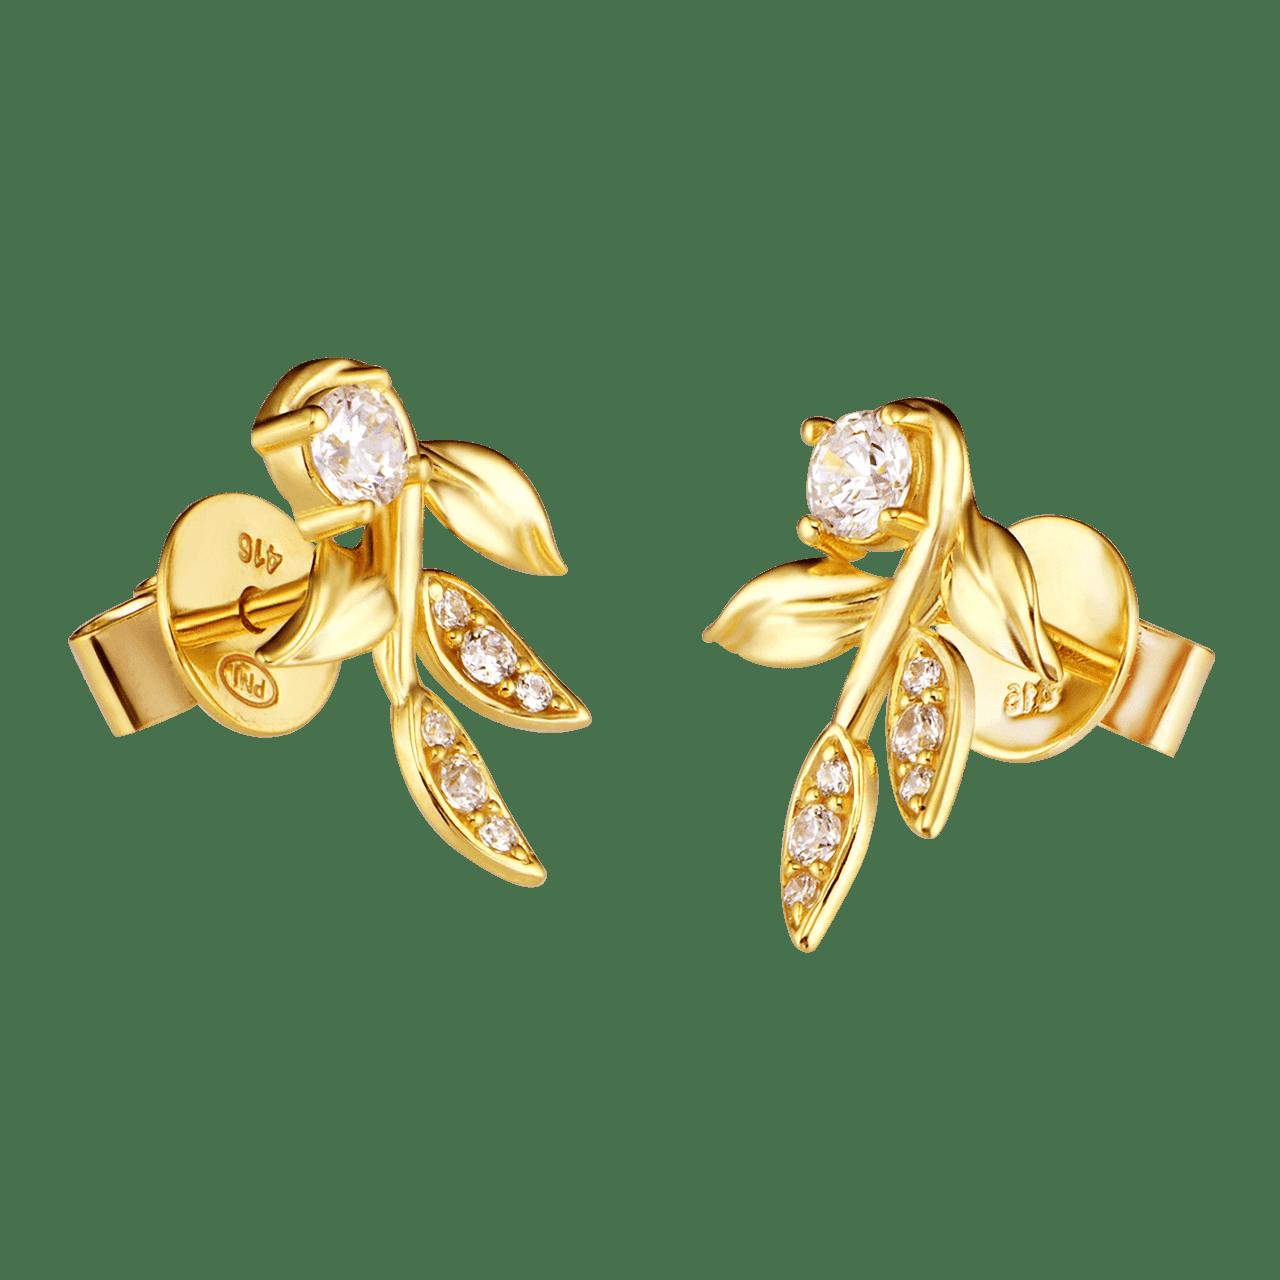 Bông tai Vàng 10K đính đá ECZ Swarovski PNJ Mystery XMXMY000153